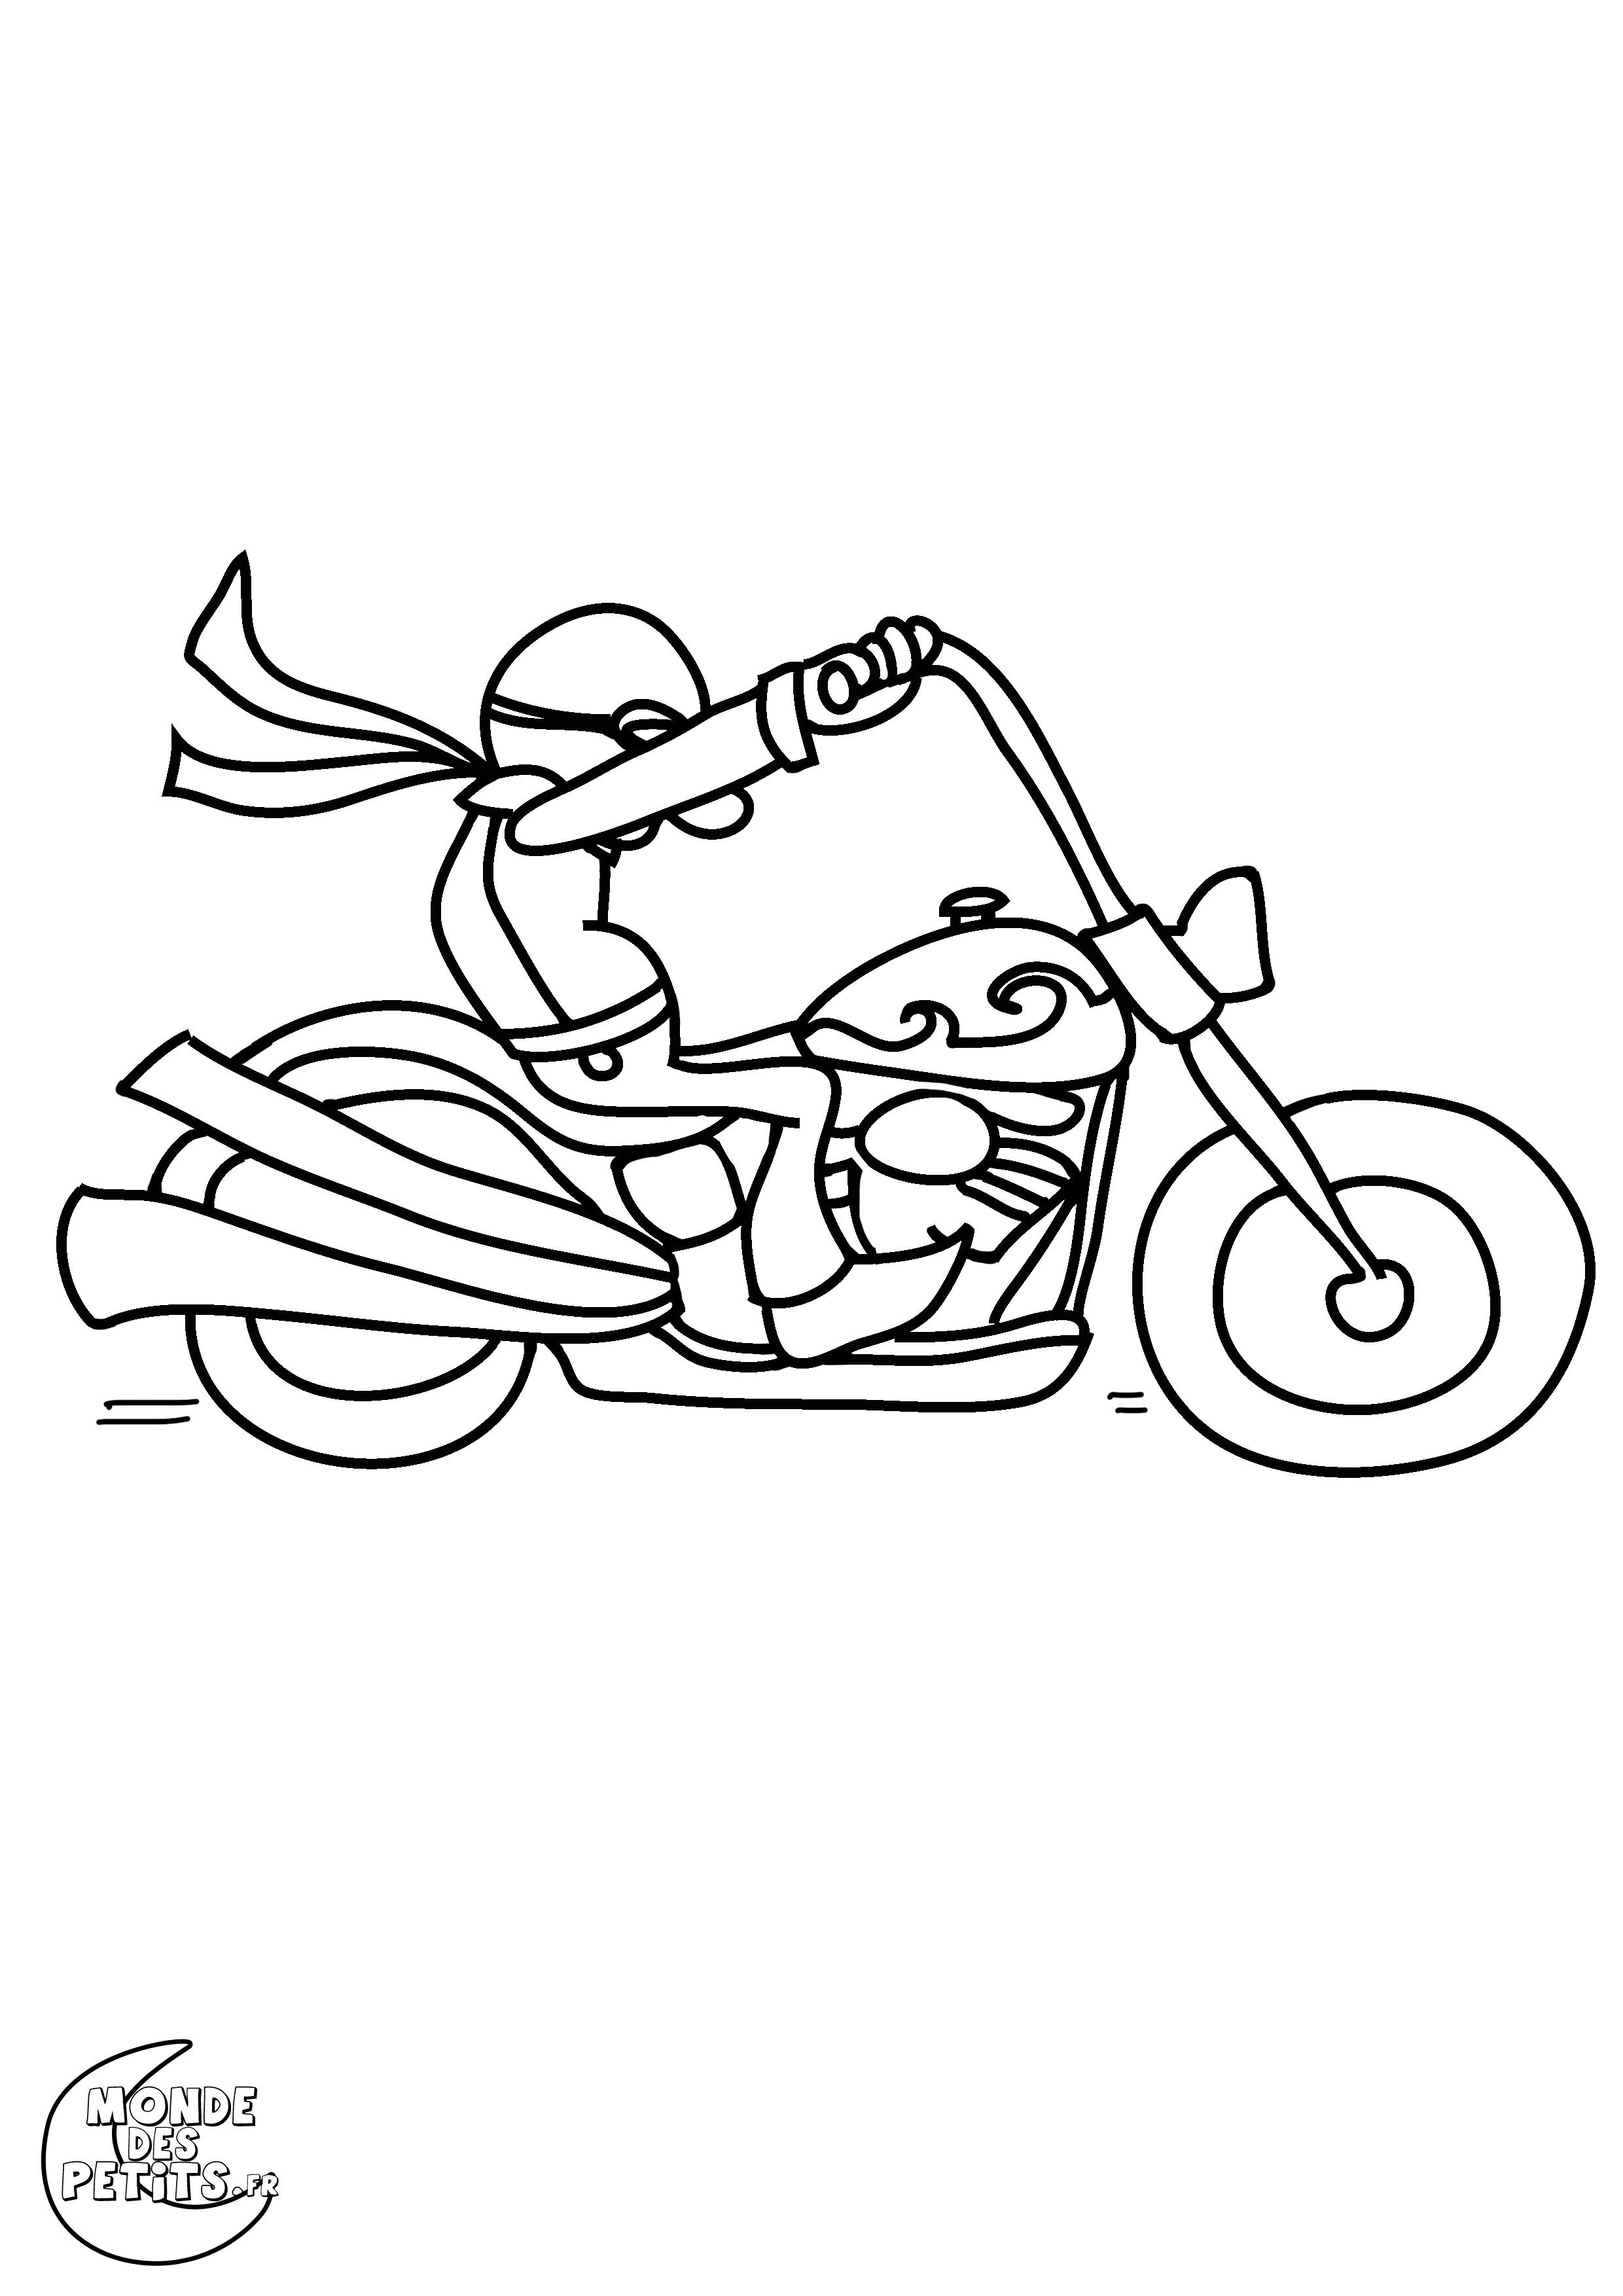 19 dessins de coloriage Harley Davidson à imprimer